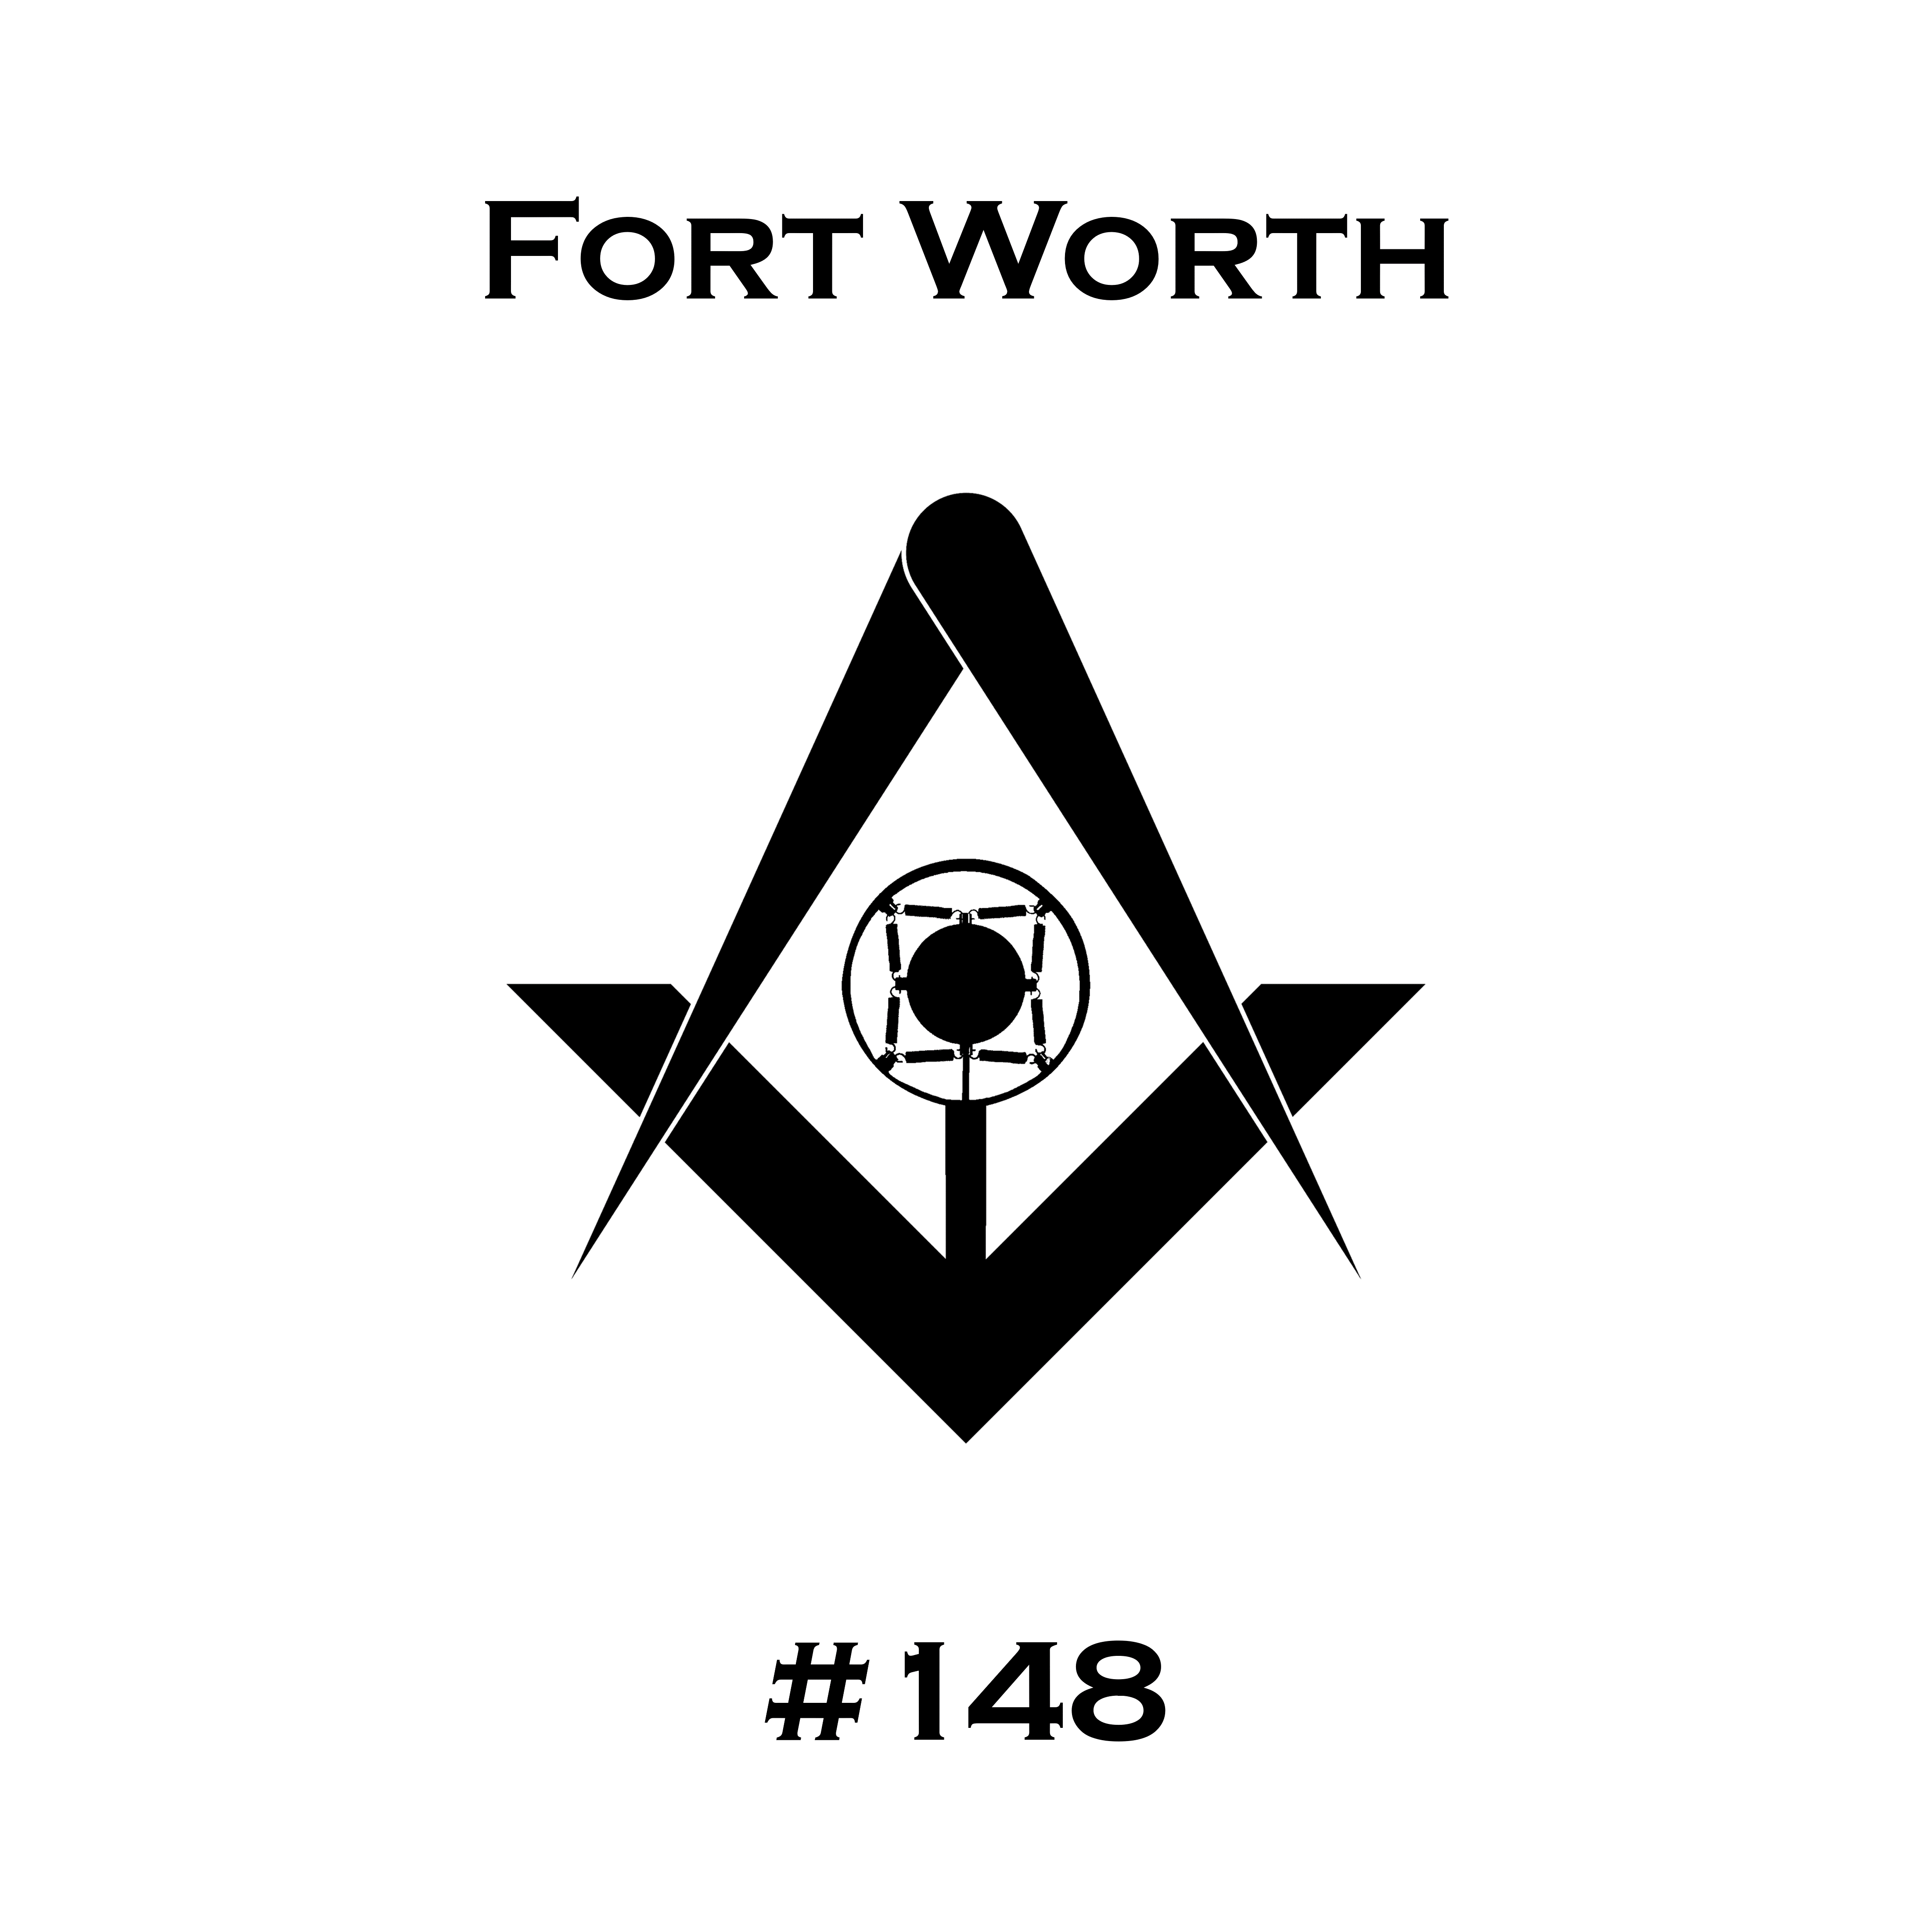 Fort Worth #148 logo